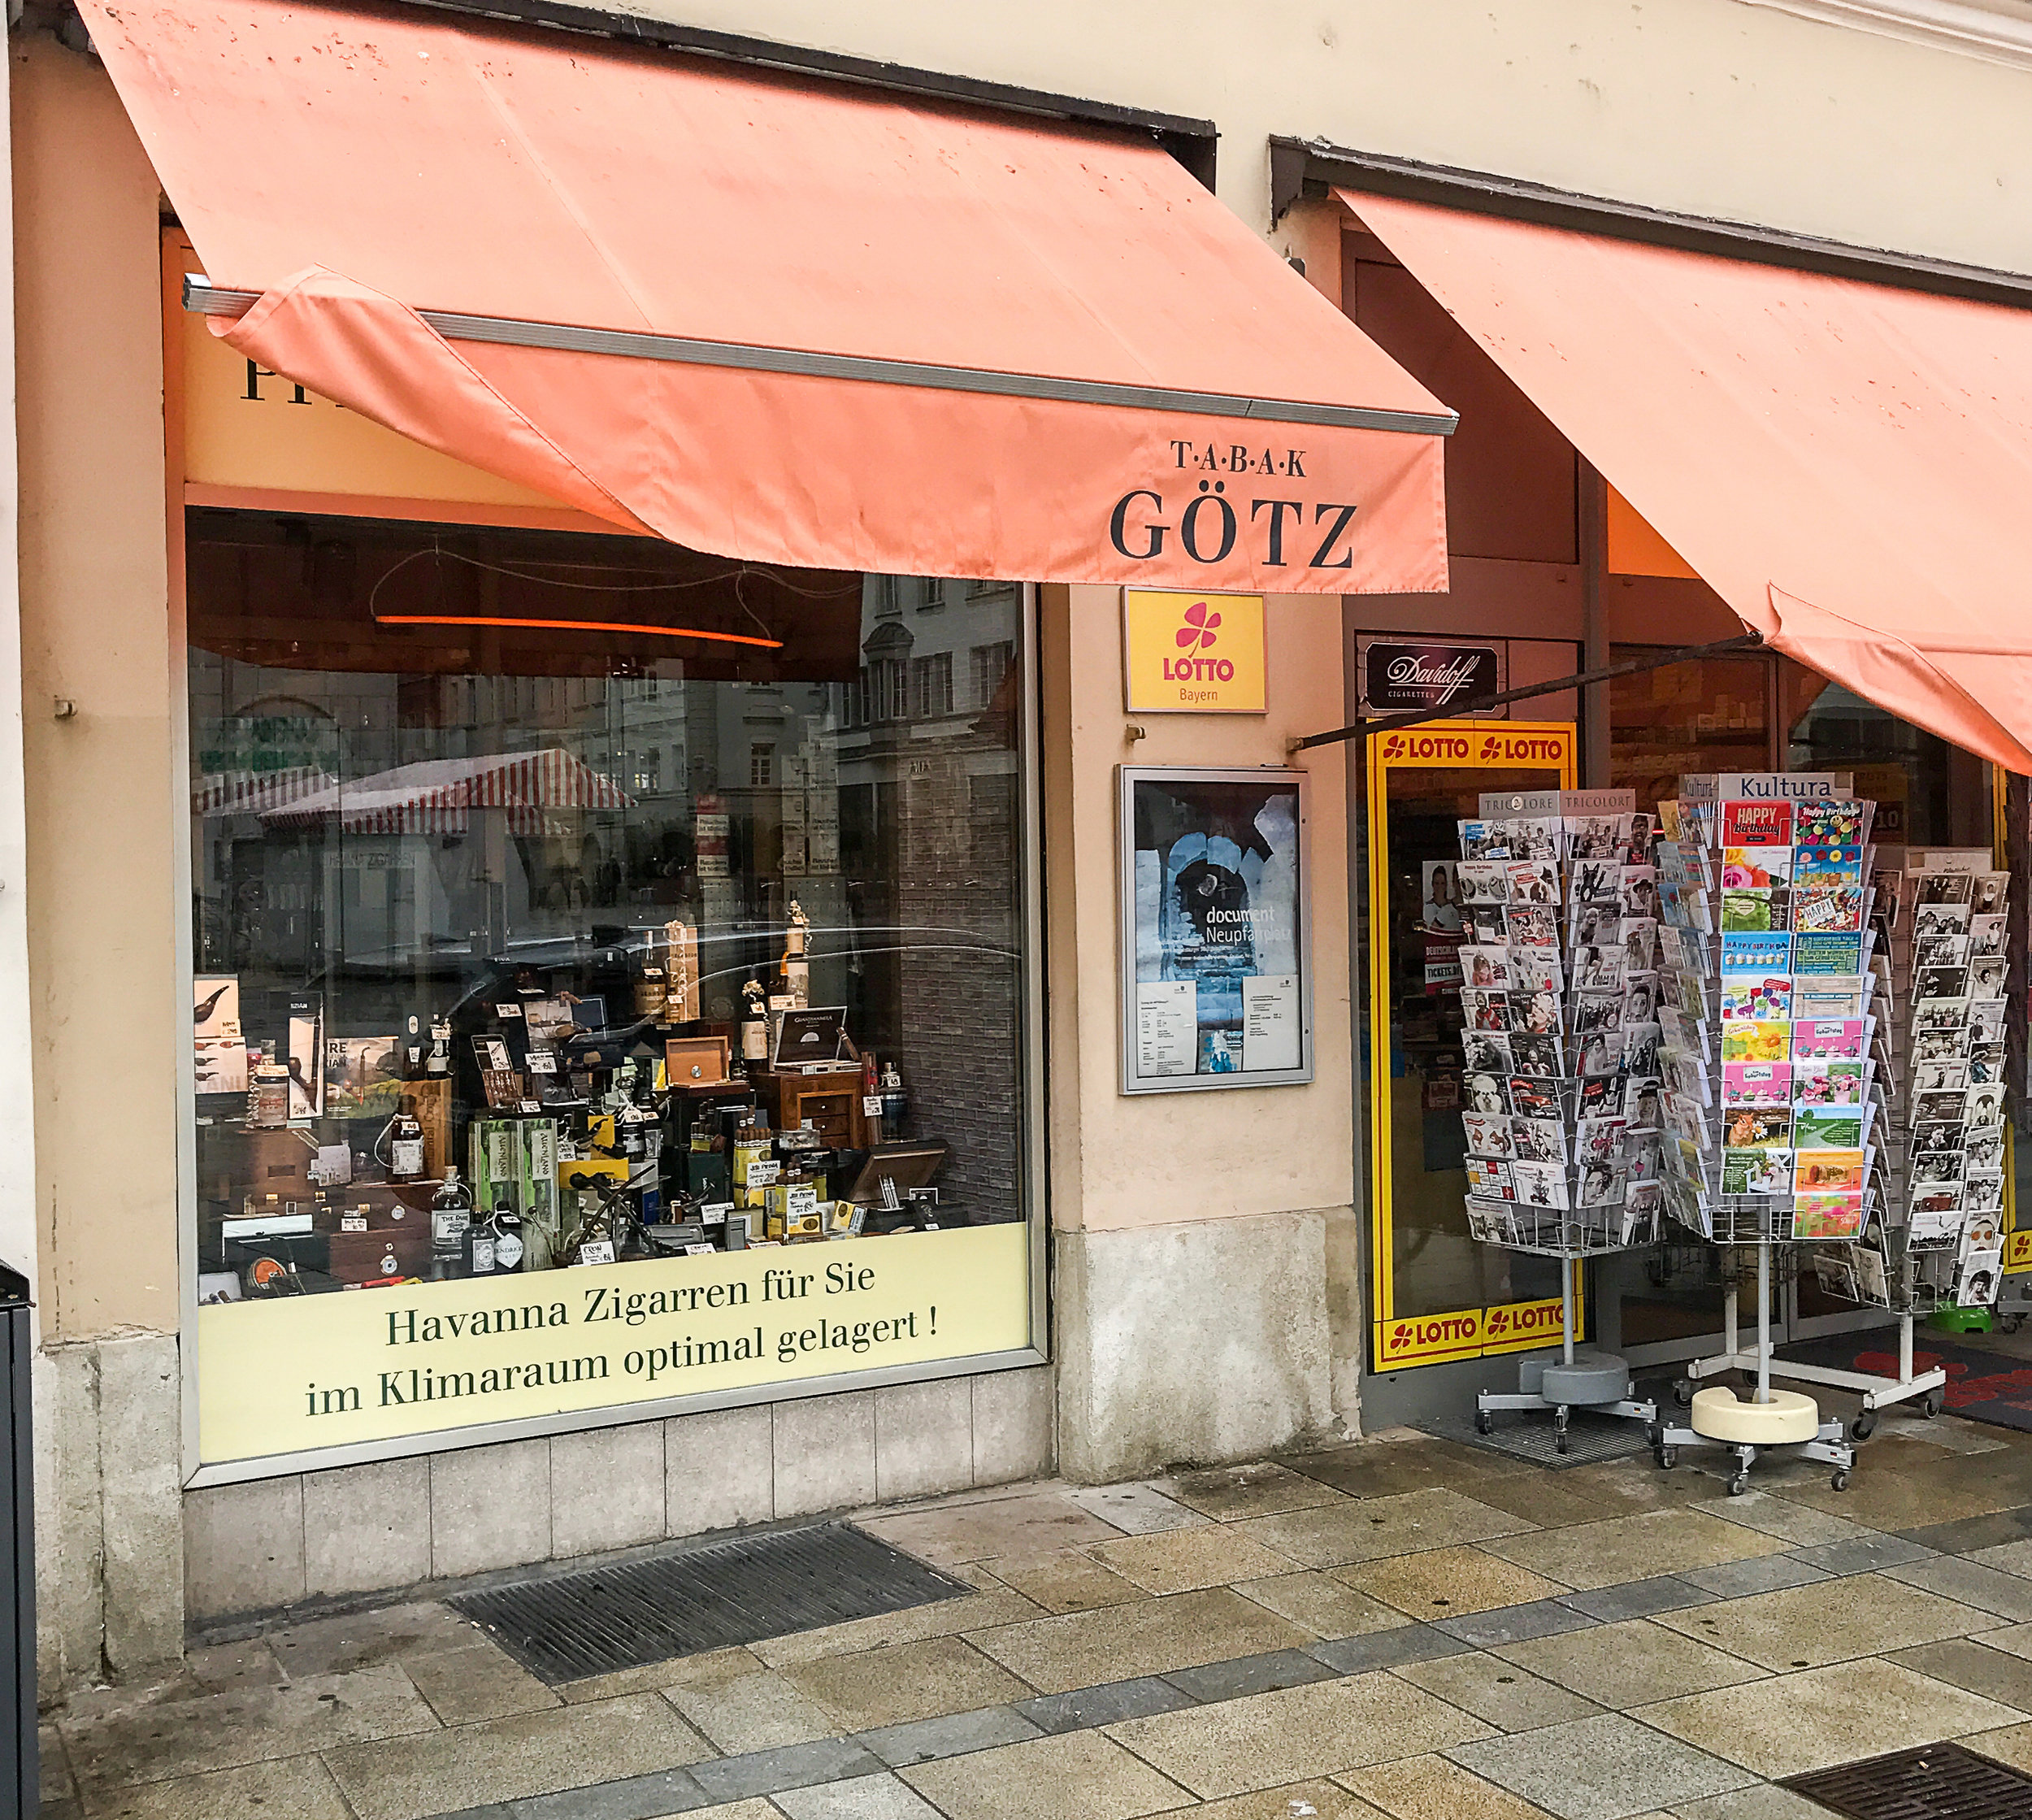 Peter Götz' main store in Regensburg.